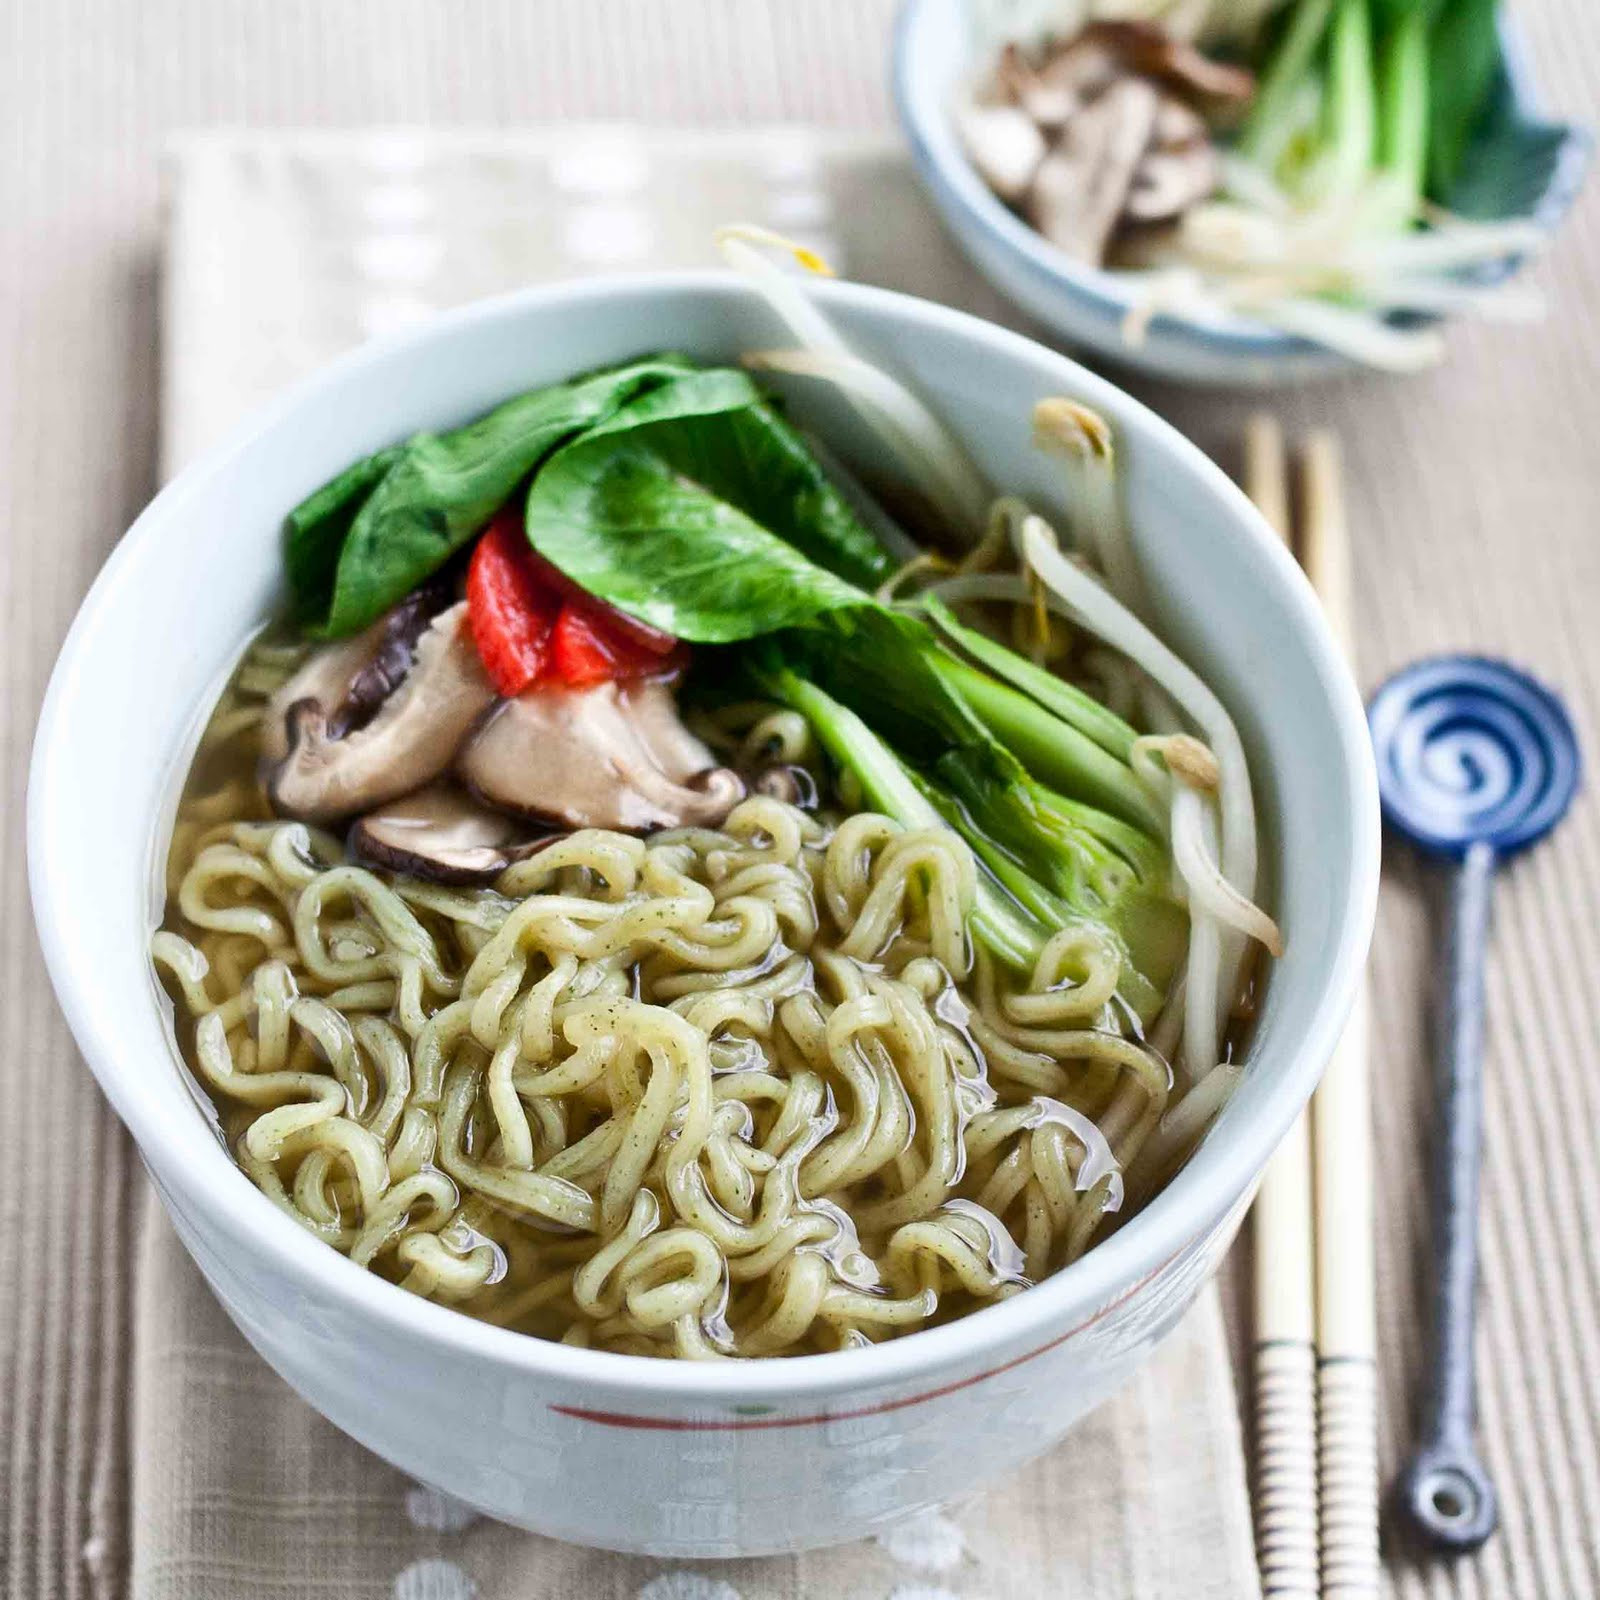 Healthy Alternative To Ramen Noodles  FOODjimoto GreeNoodle Healthier Instant Ramen